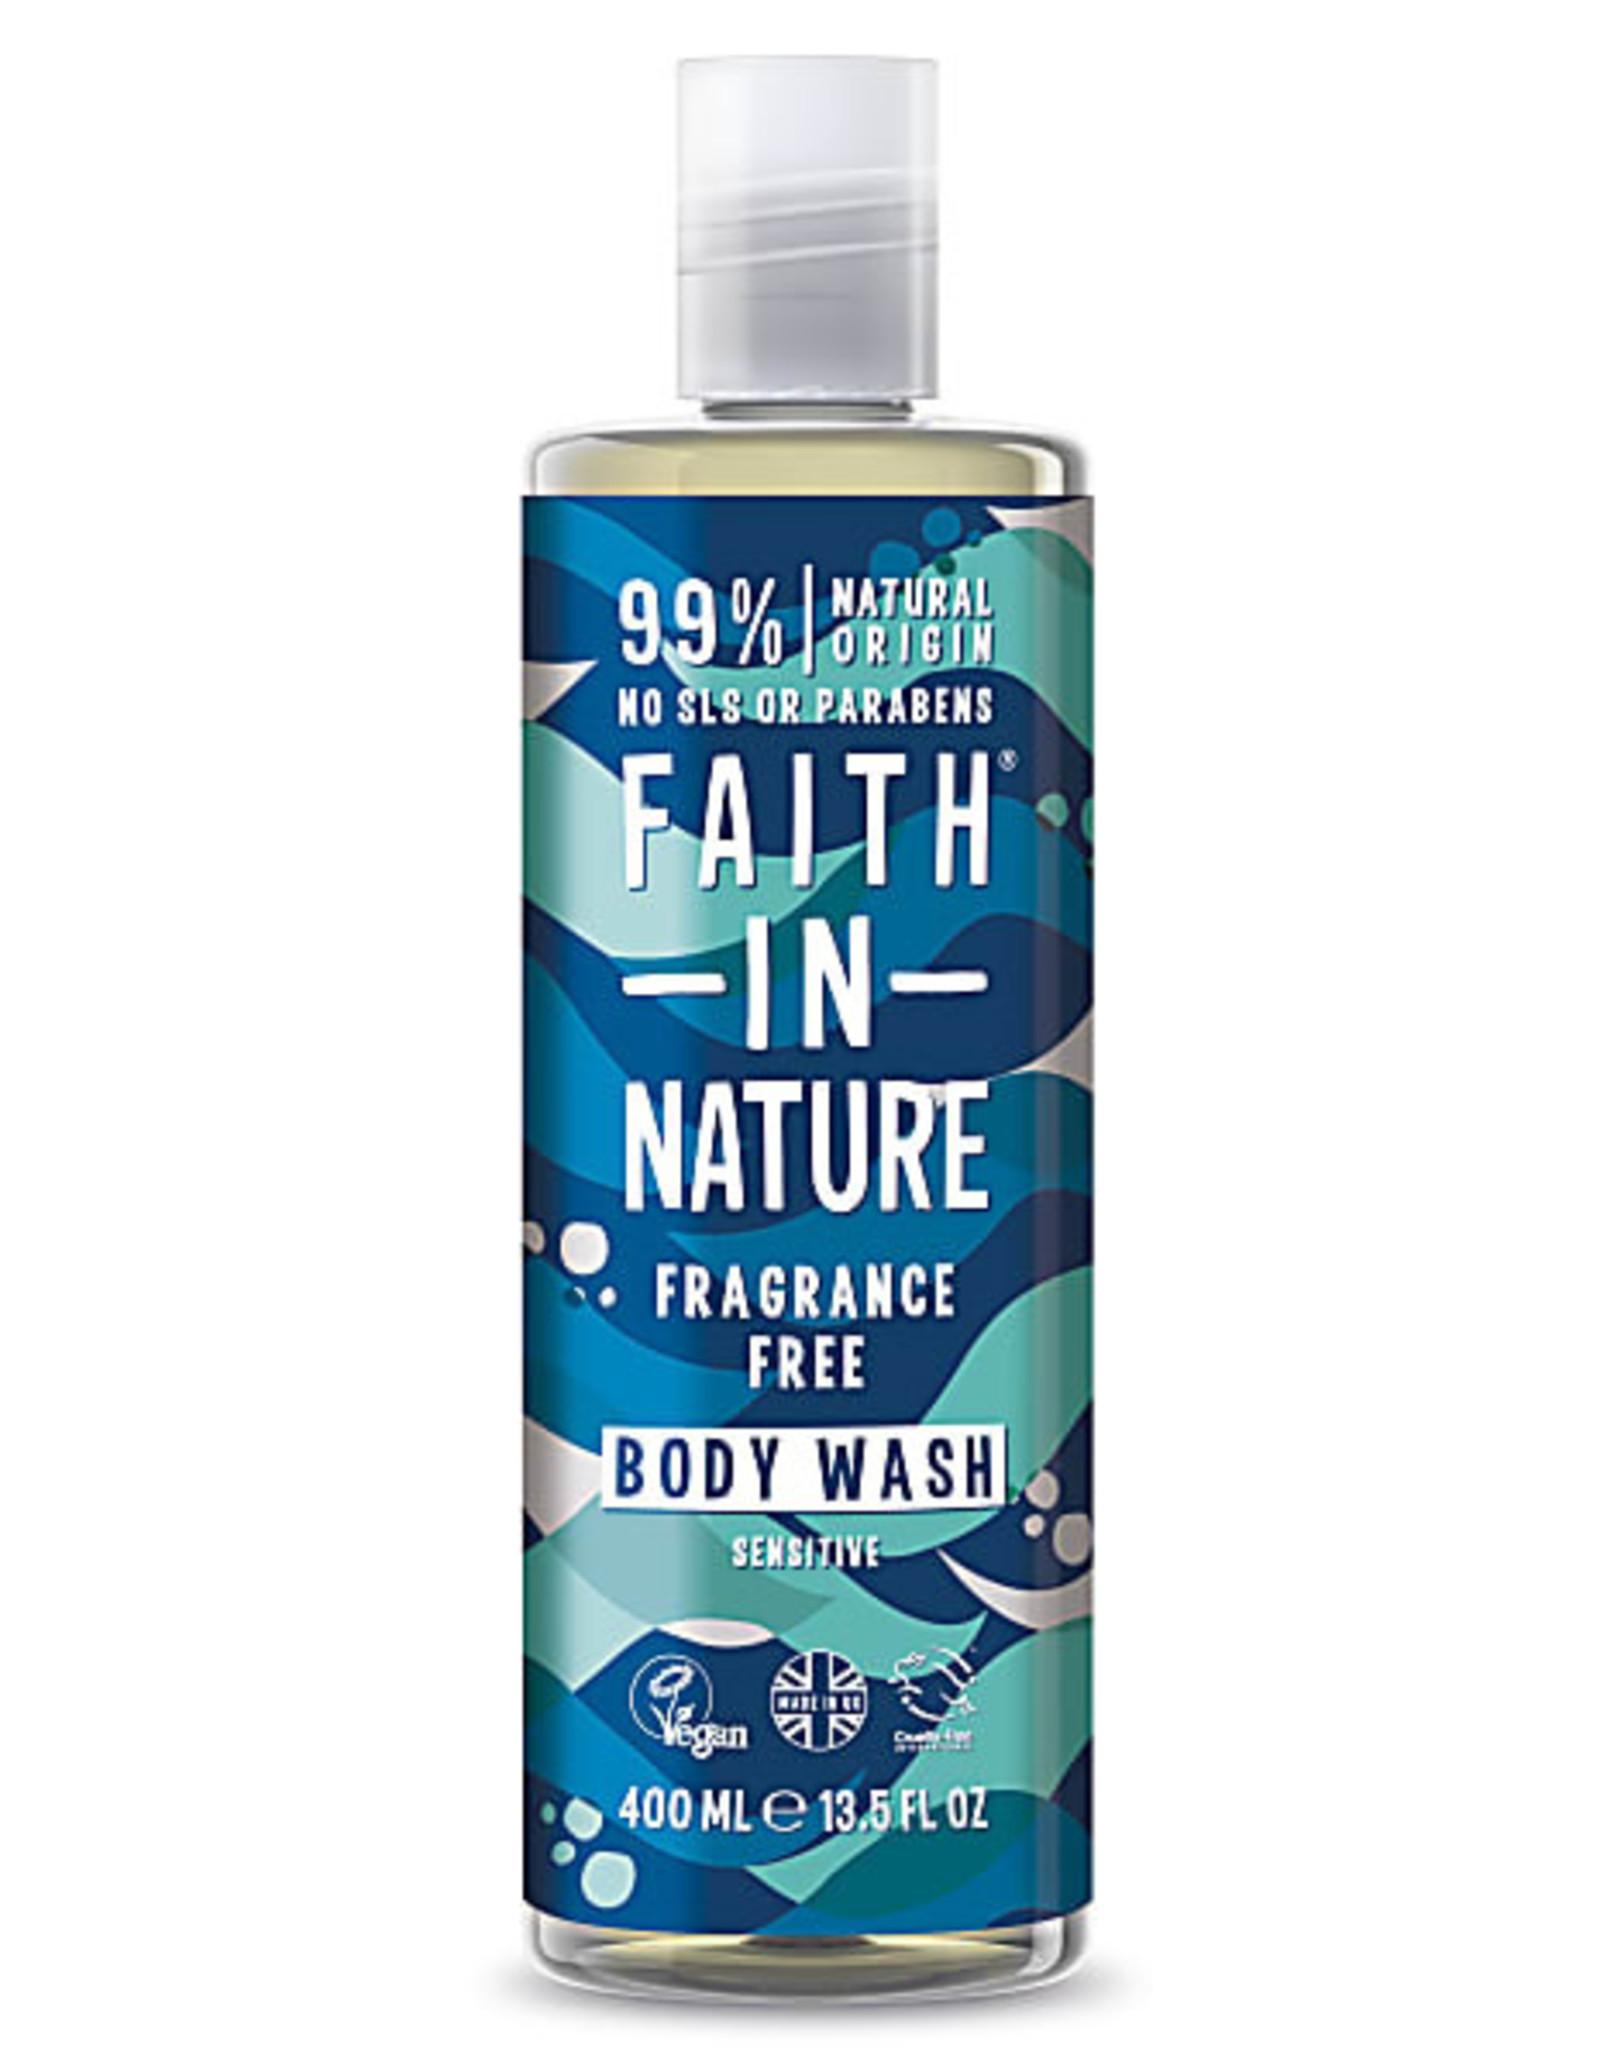 Faith in Nature Faith in Nature Fragrance Free Bath & Shower Gel 400ml